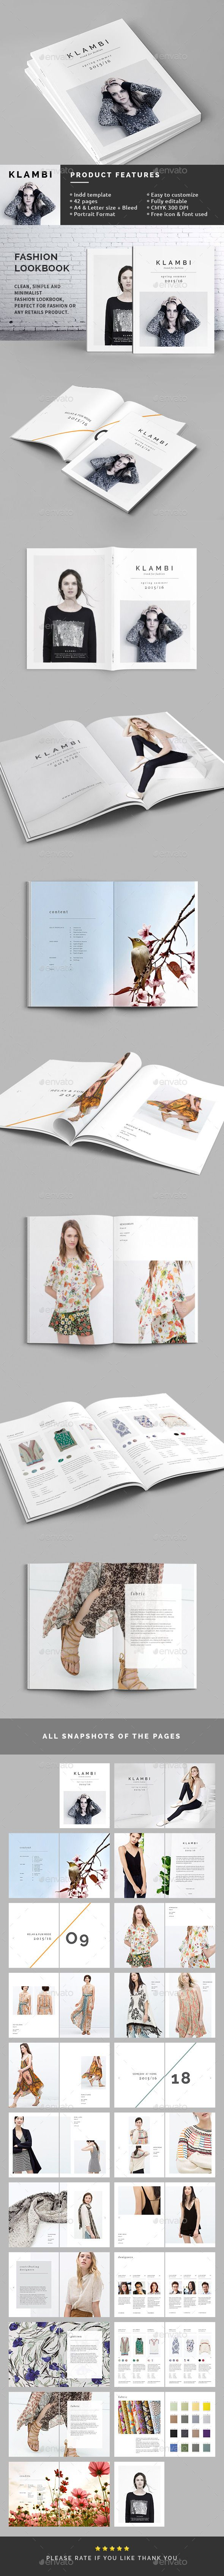 Fashion Lookbook Template #design Download: http://graphicriver.net/item/fashion-lookbook/11401509?ref=ksioks